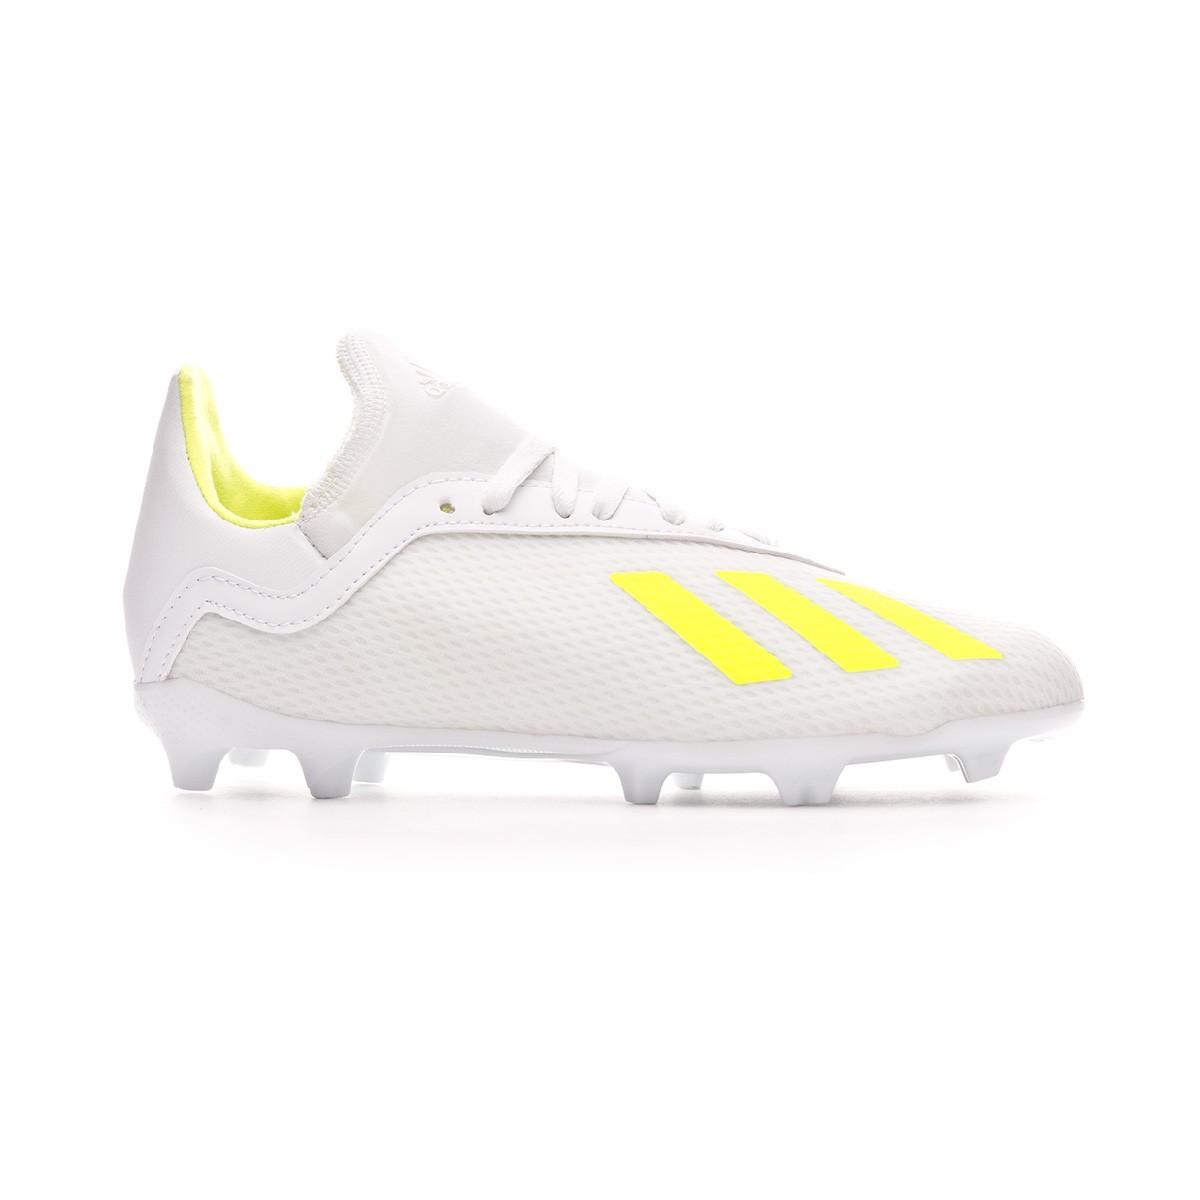 Chaussure de foot adidas X 18.3 FG enfant